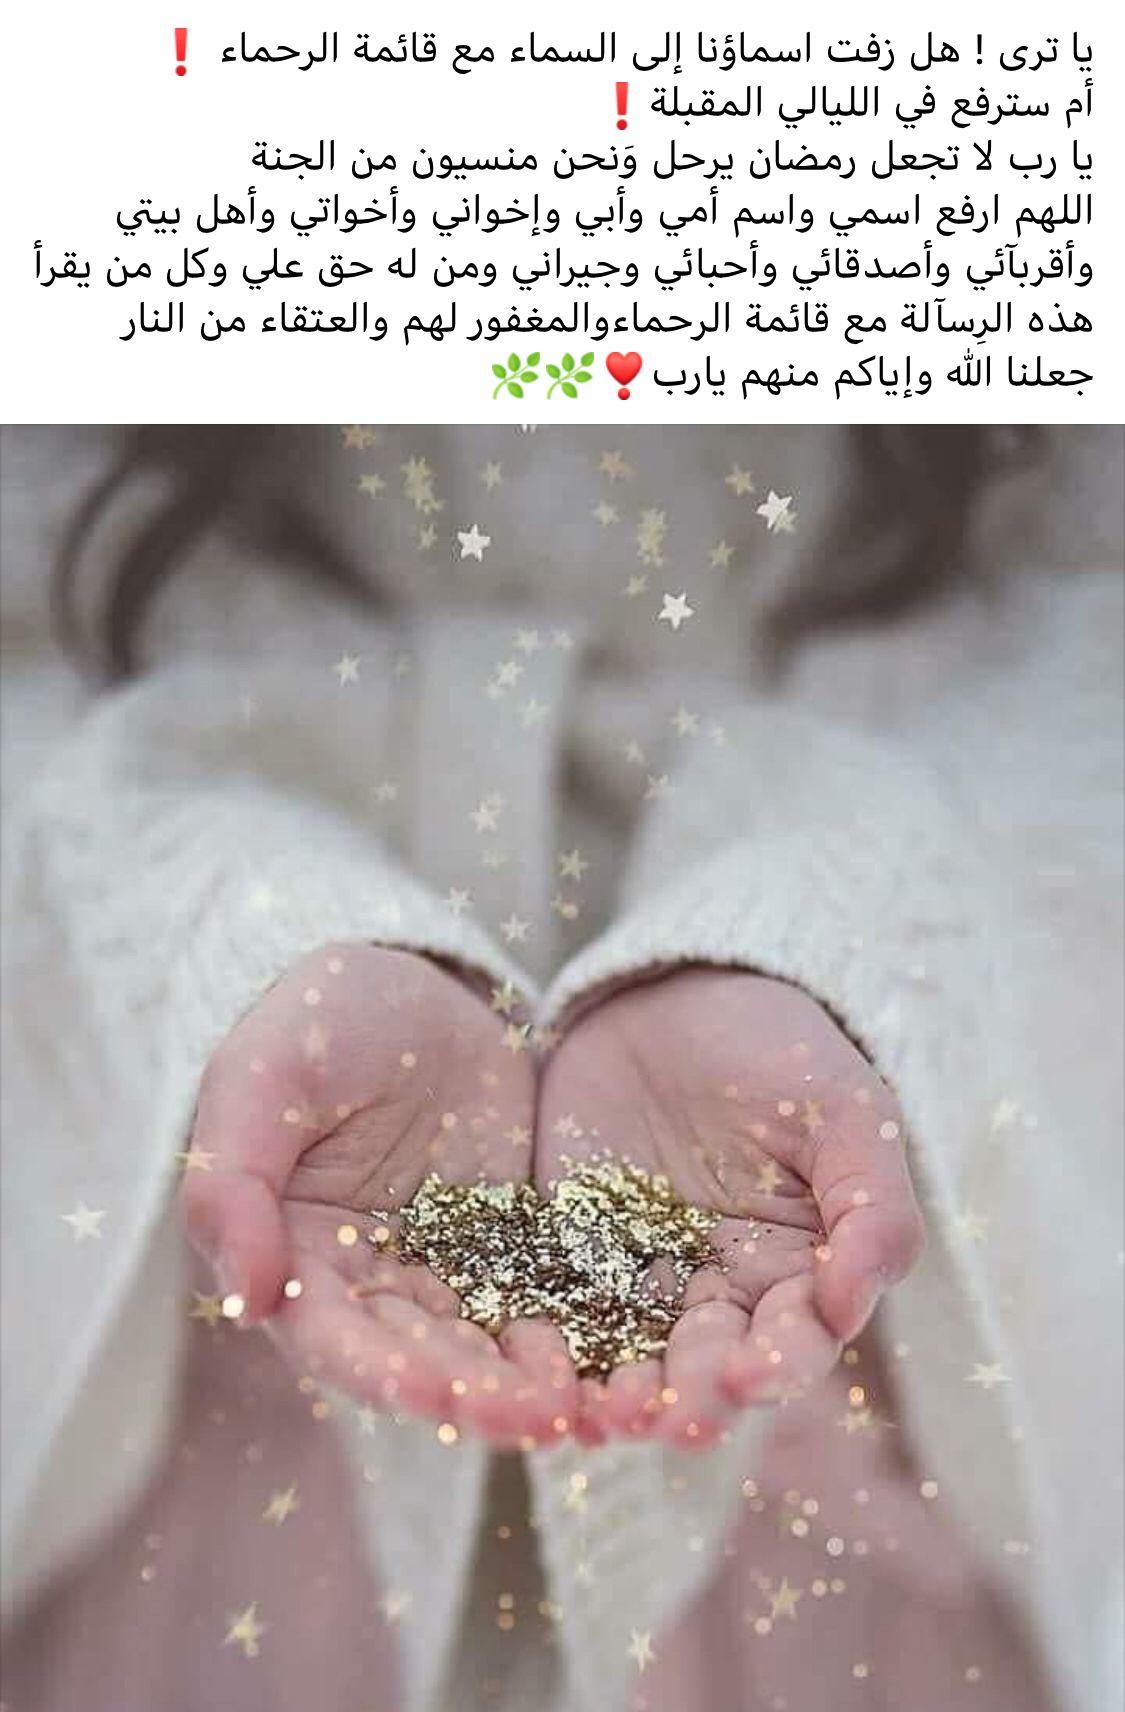 Pin By صورة و كلمة On رمضان كريم Ramadan Kareem Islamic Pictures Ramadan Islamic Quotes